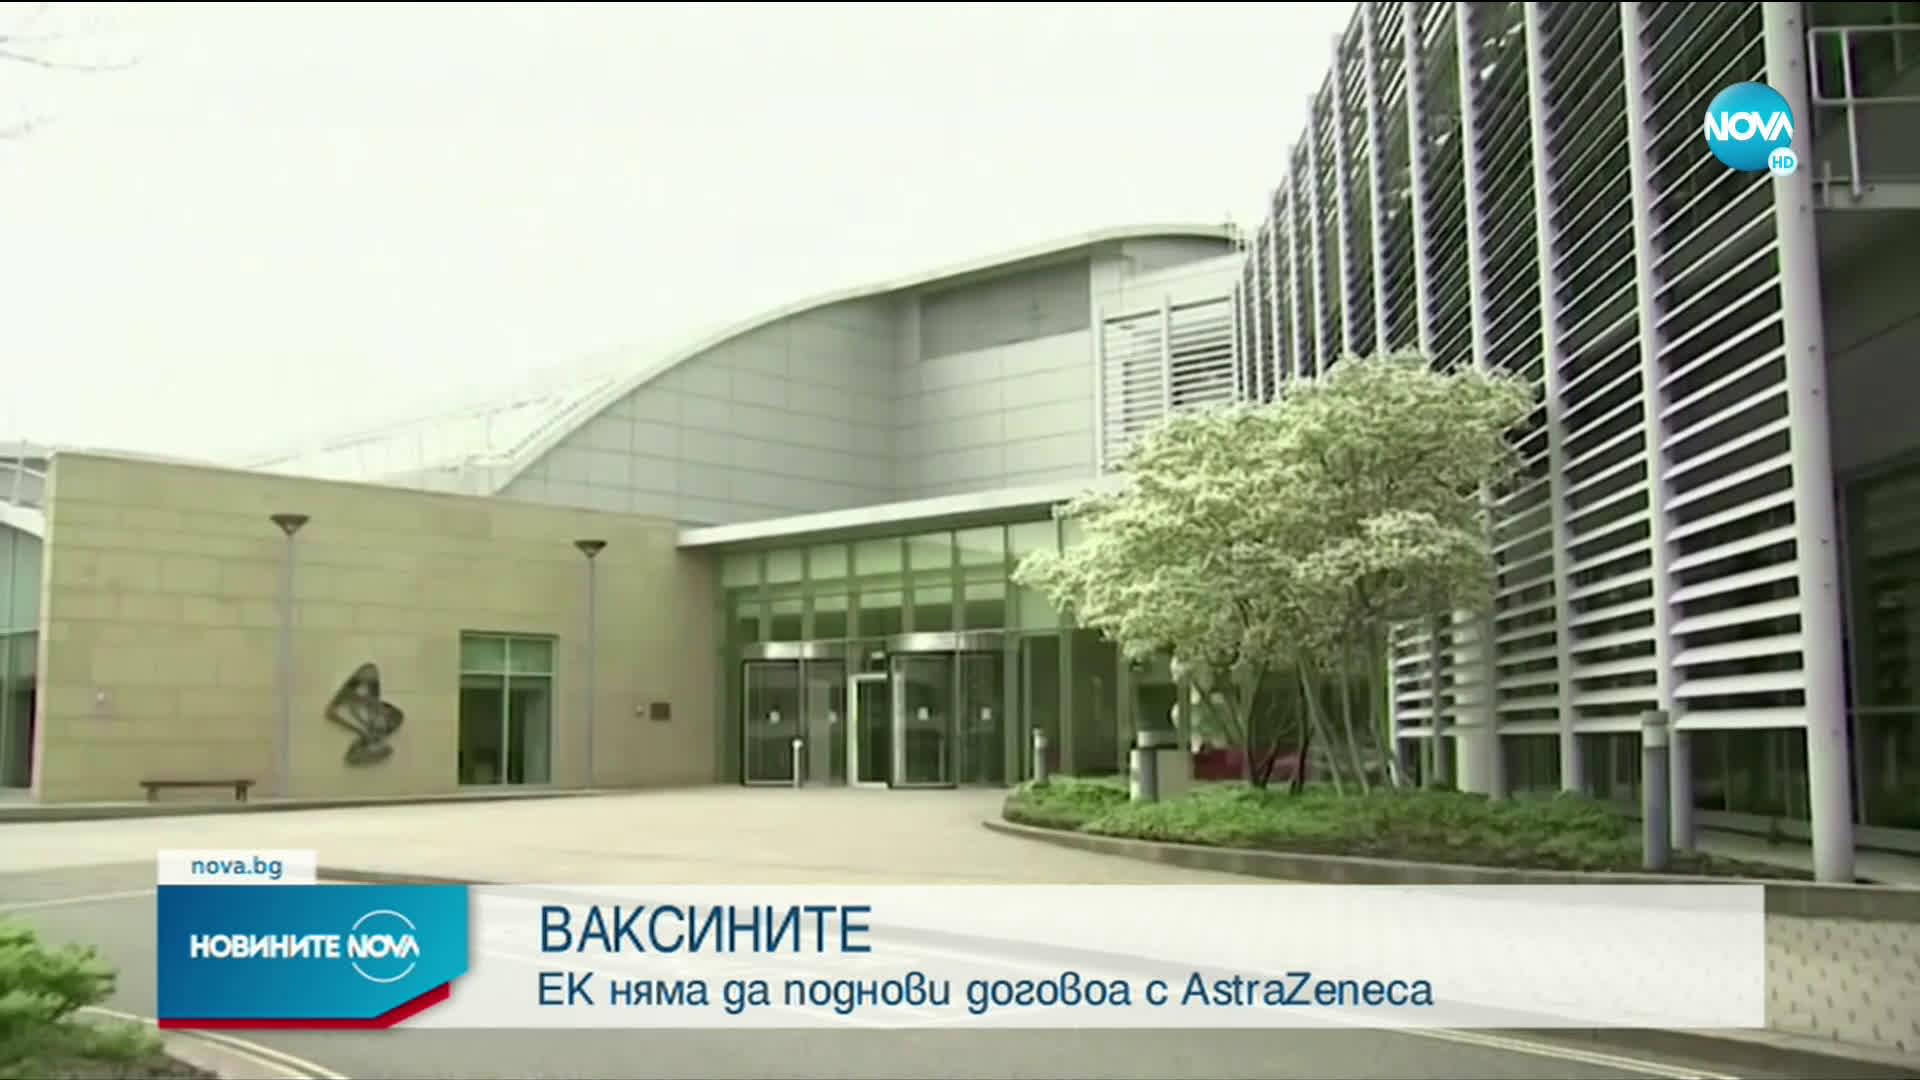 EK няма да поднови догова с AstraZeneca